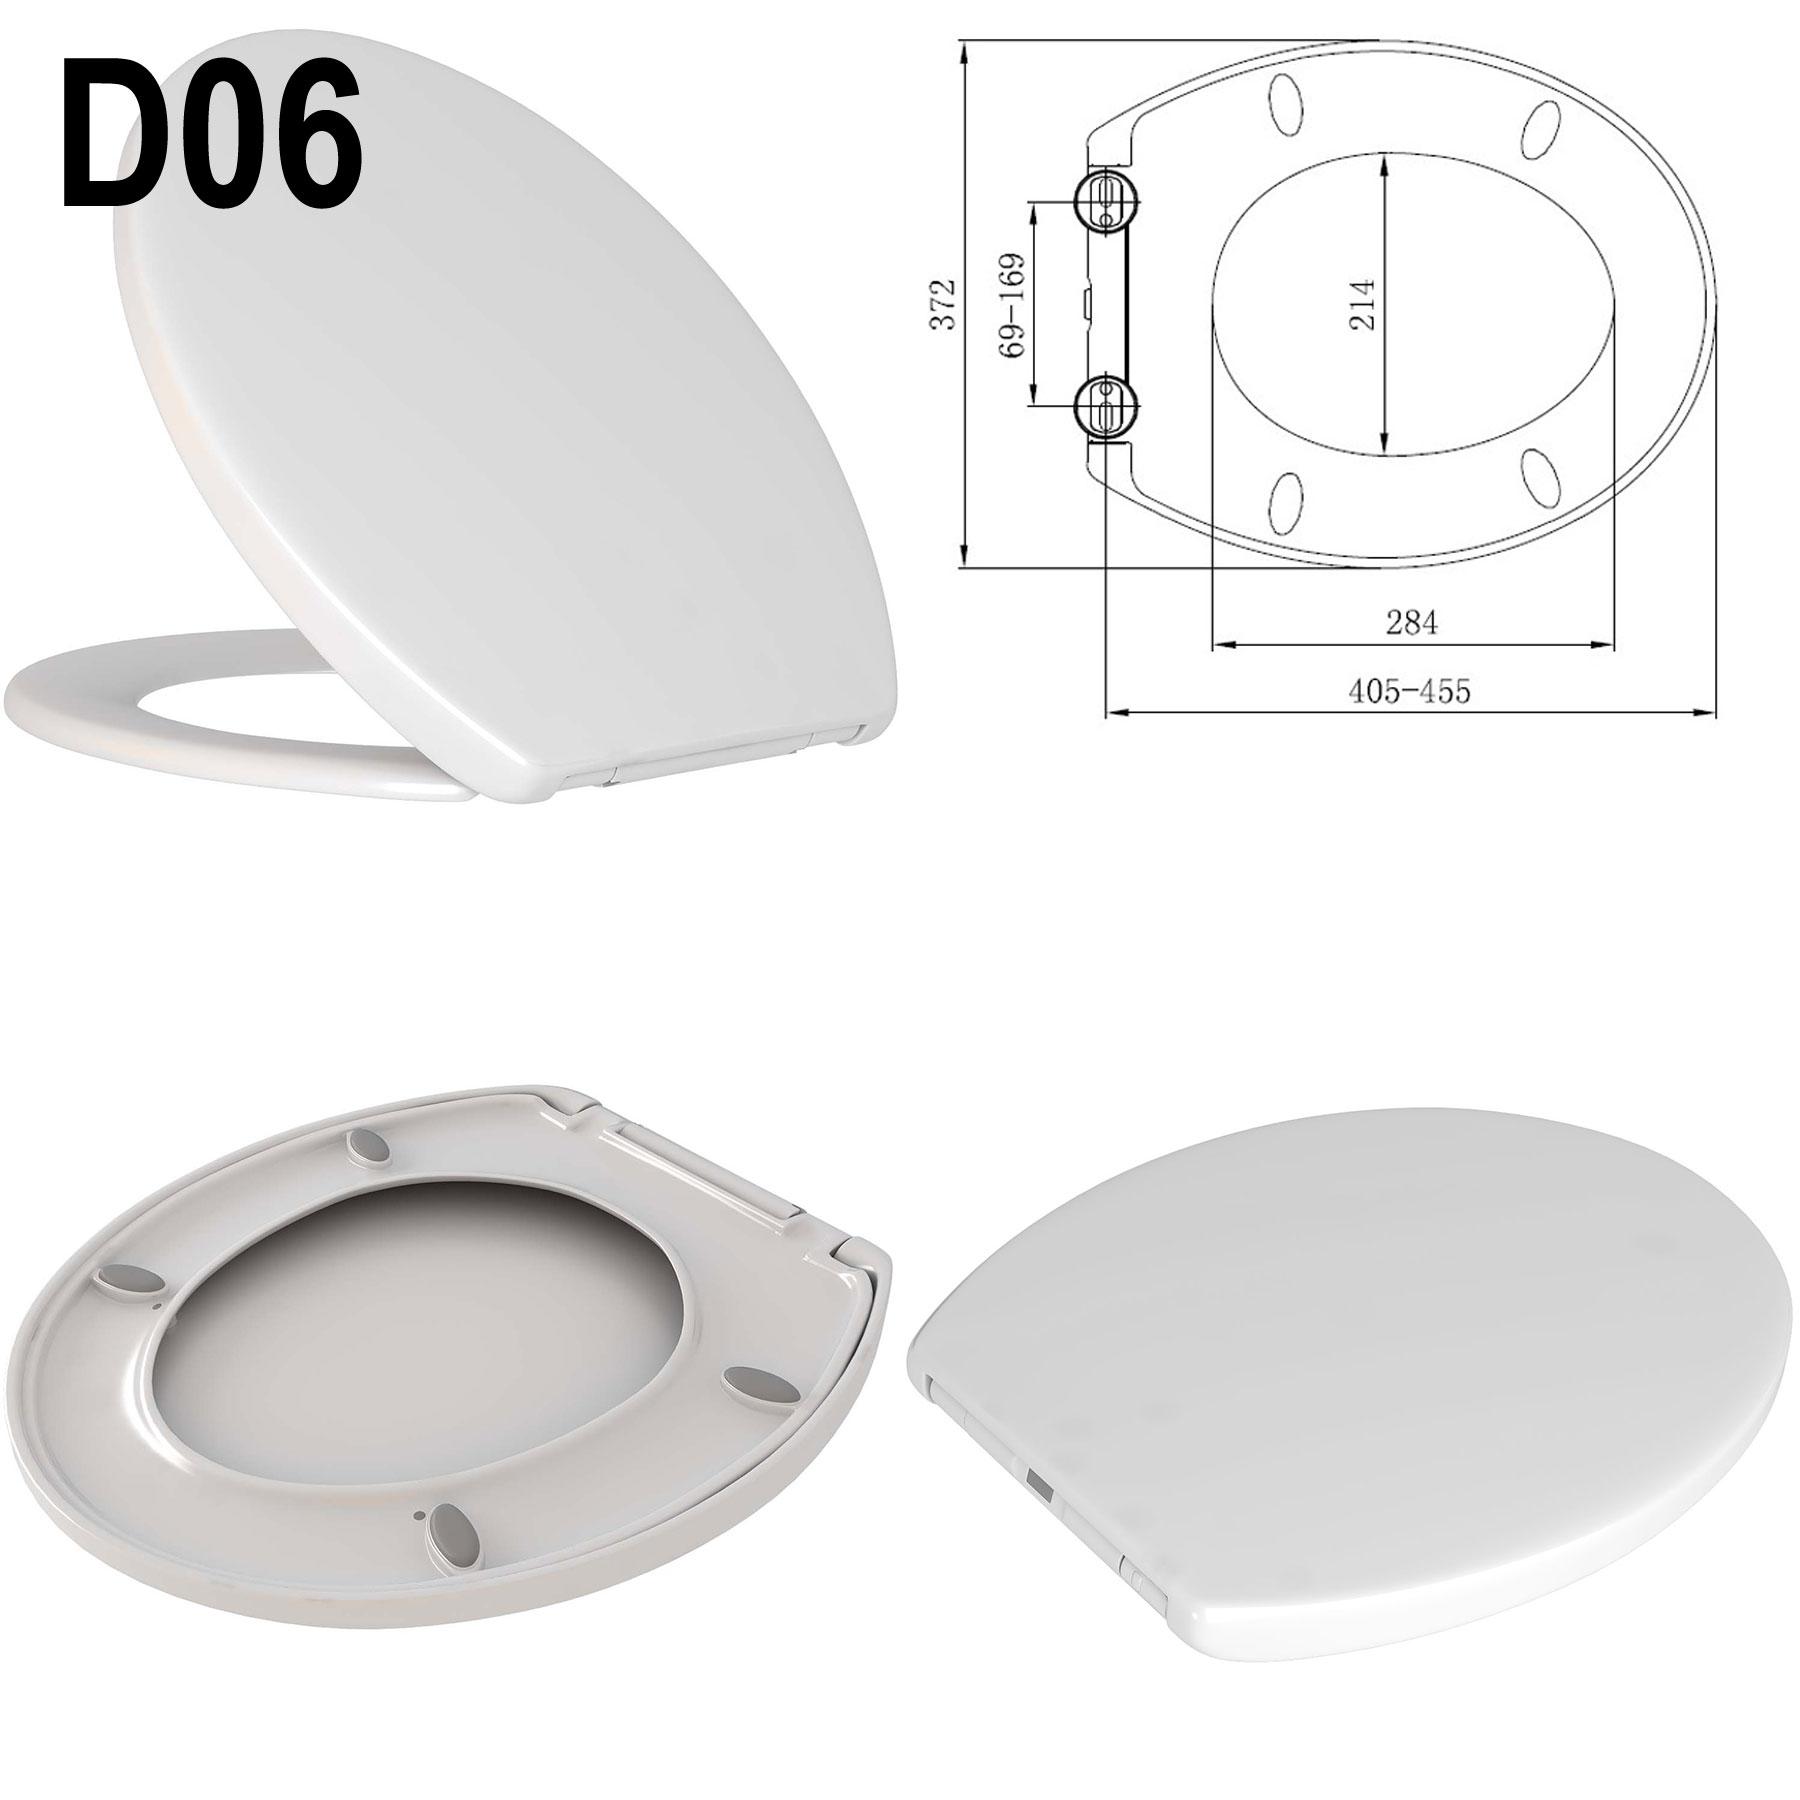 design klodeckel toilettensitz wc sitz absenkautomatik led kunststoff weiss top ebay. Black Bedroom Furniture Sets. Home Design Ideas